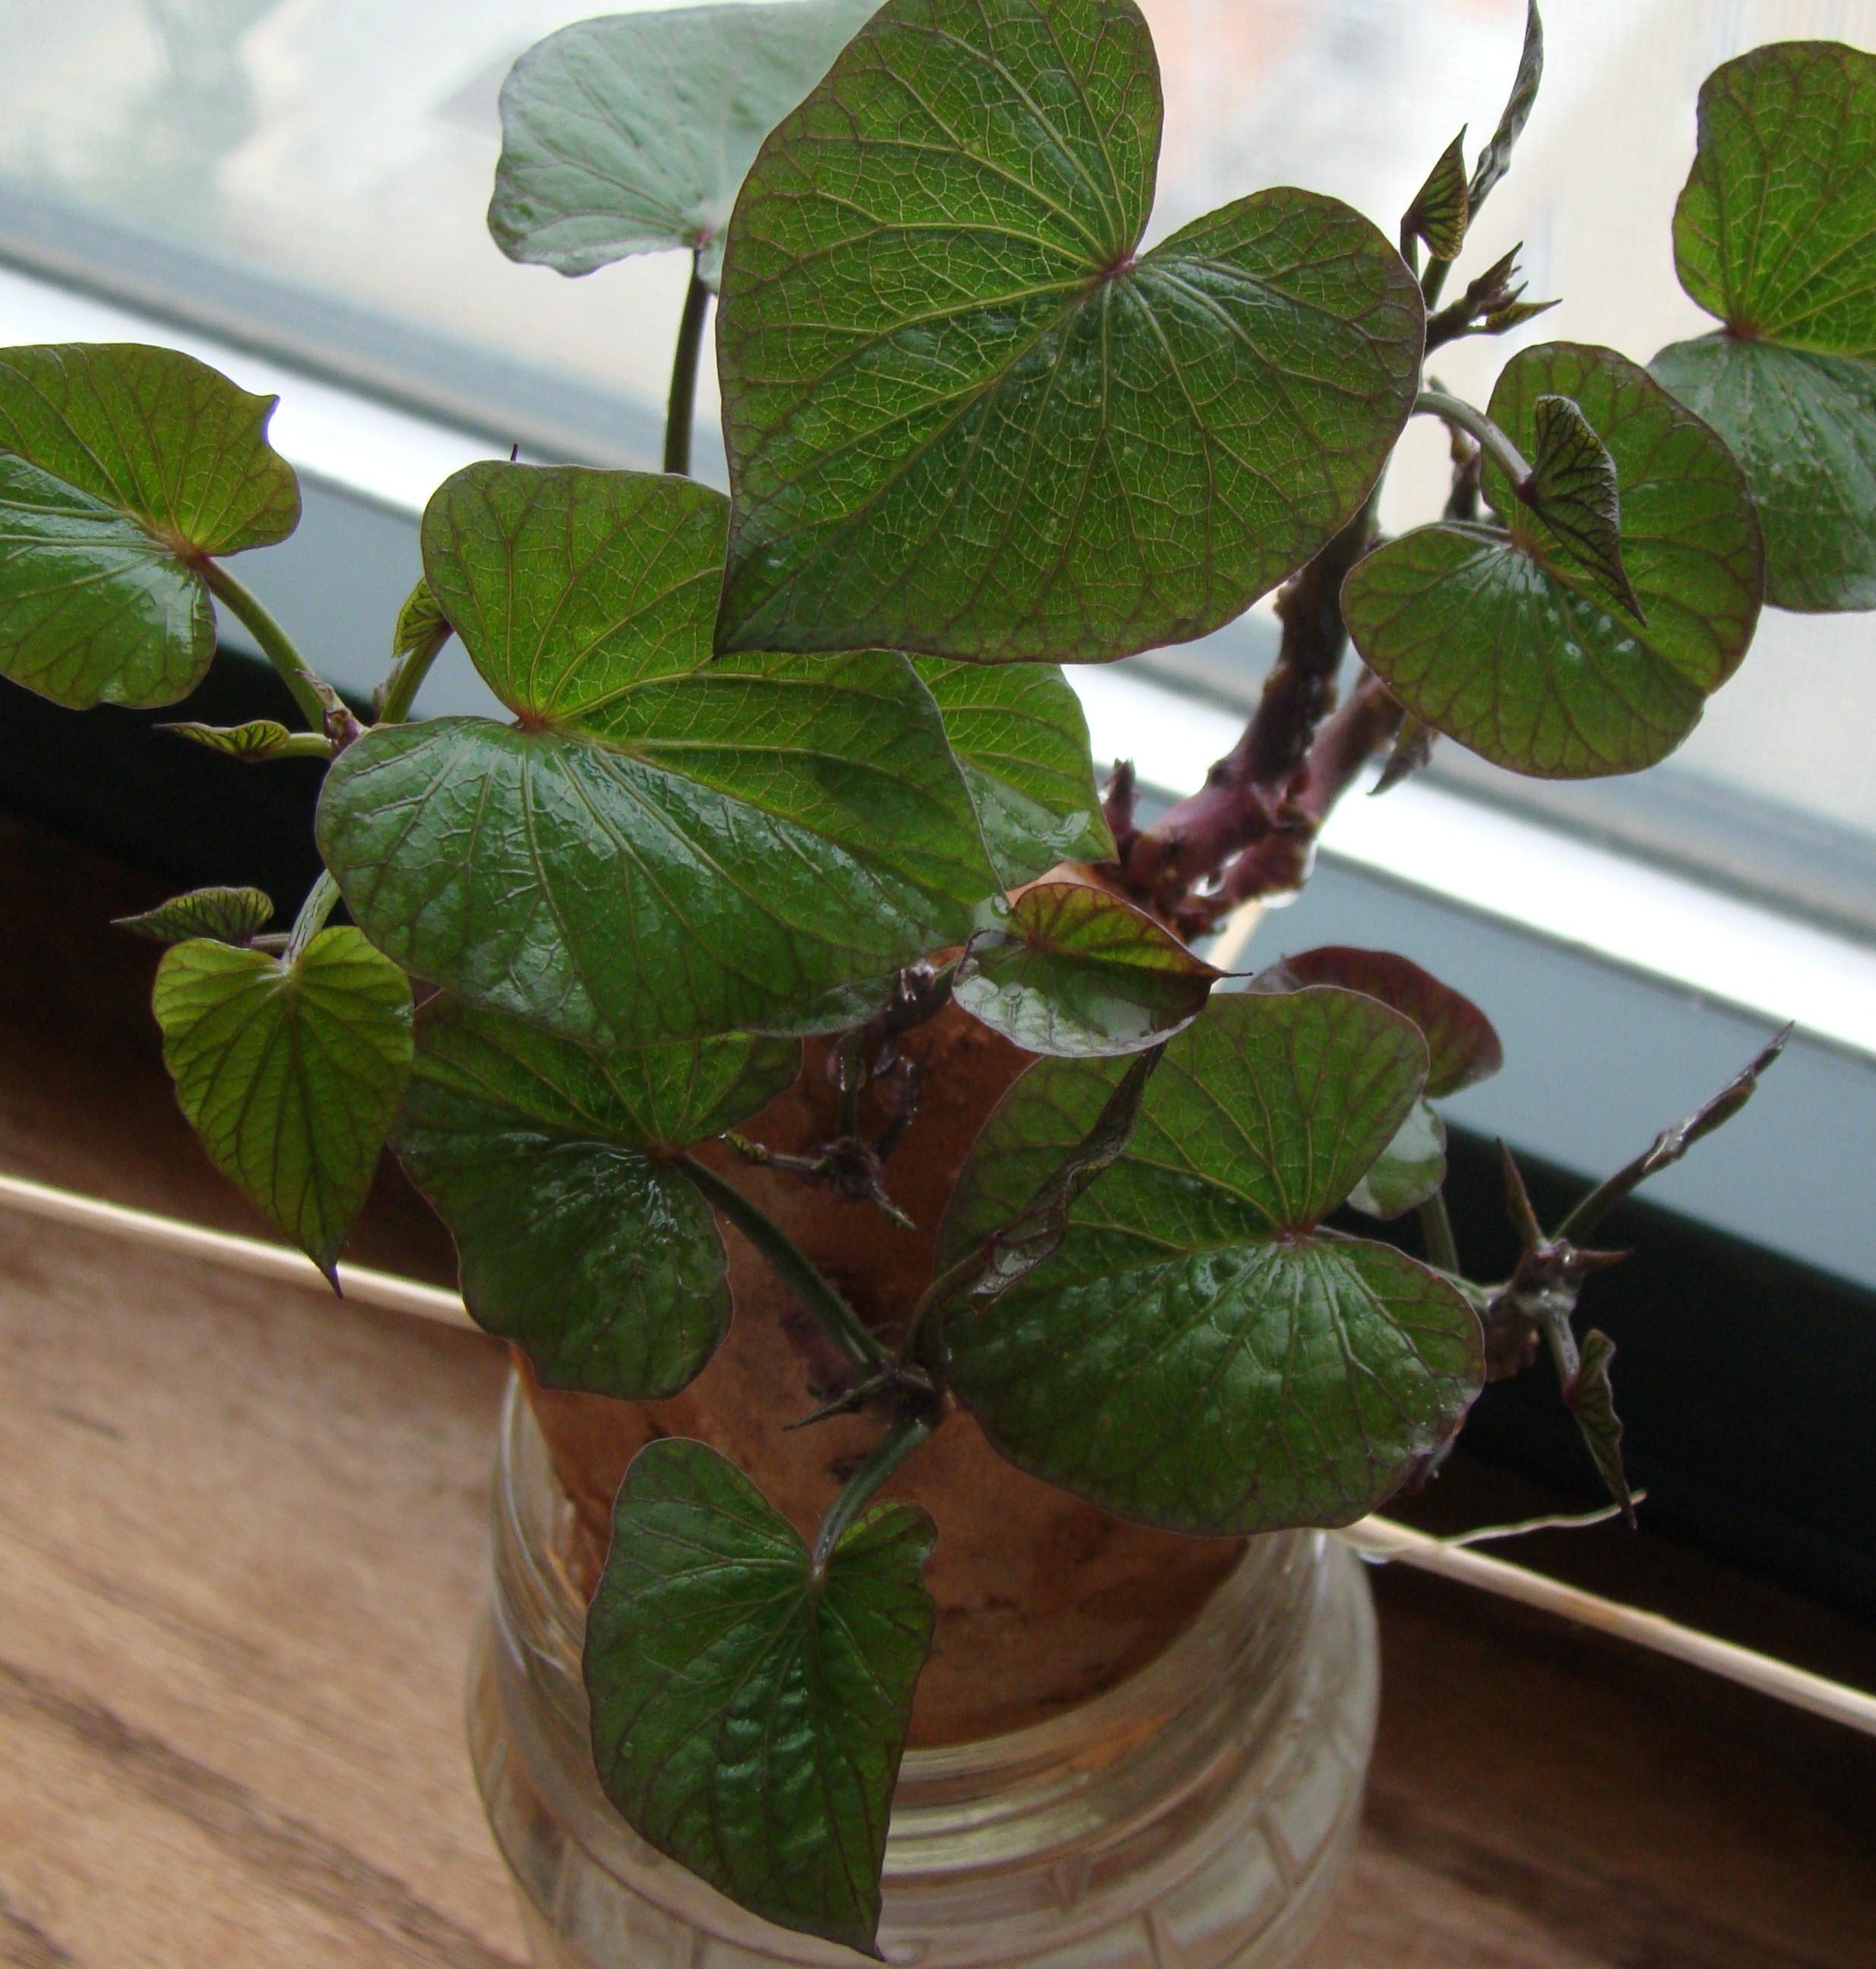 How To Grow Sweet Potato Vine  Kid stuff Sweet potato vine project has e a long way